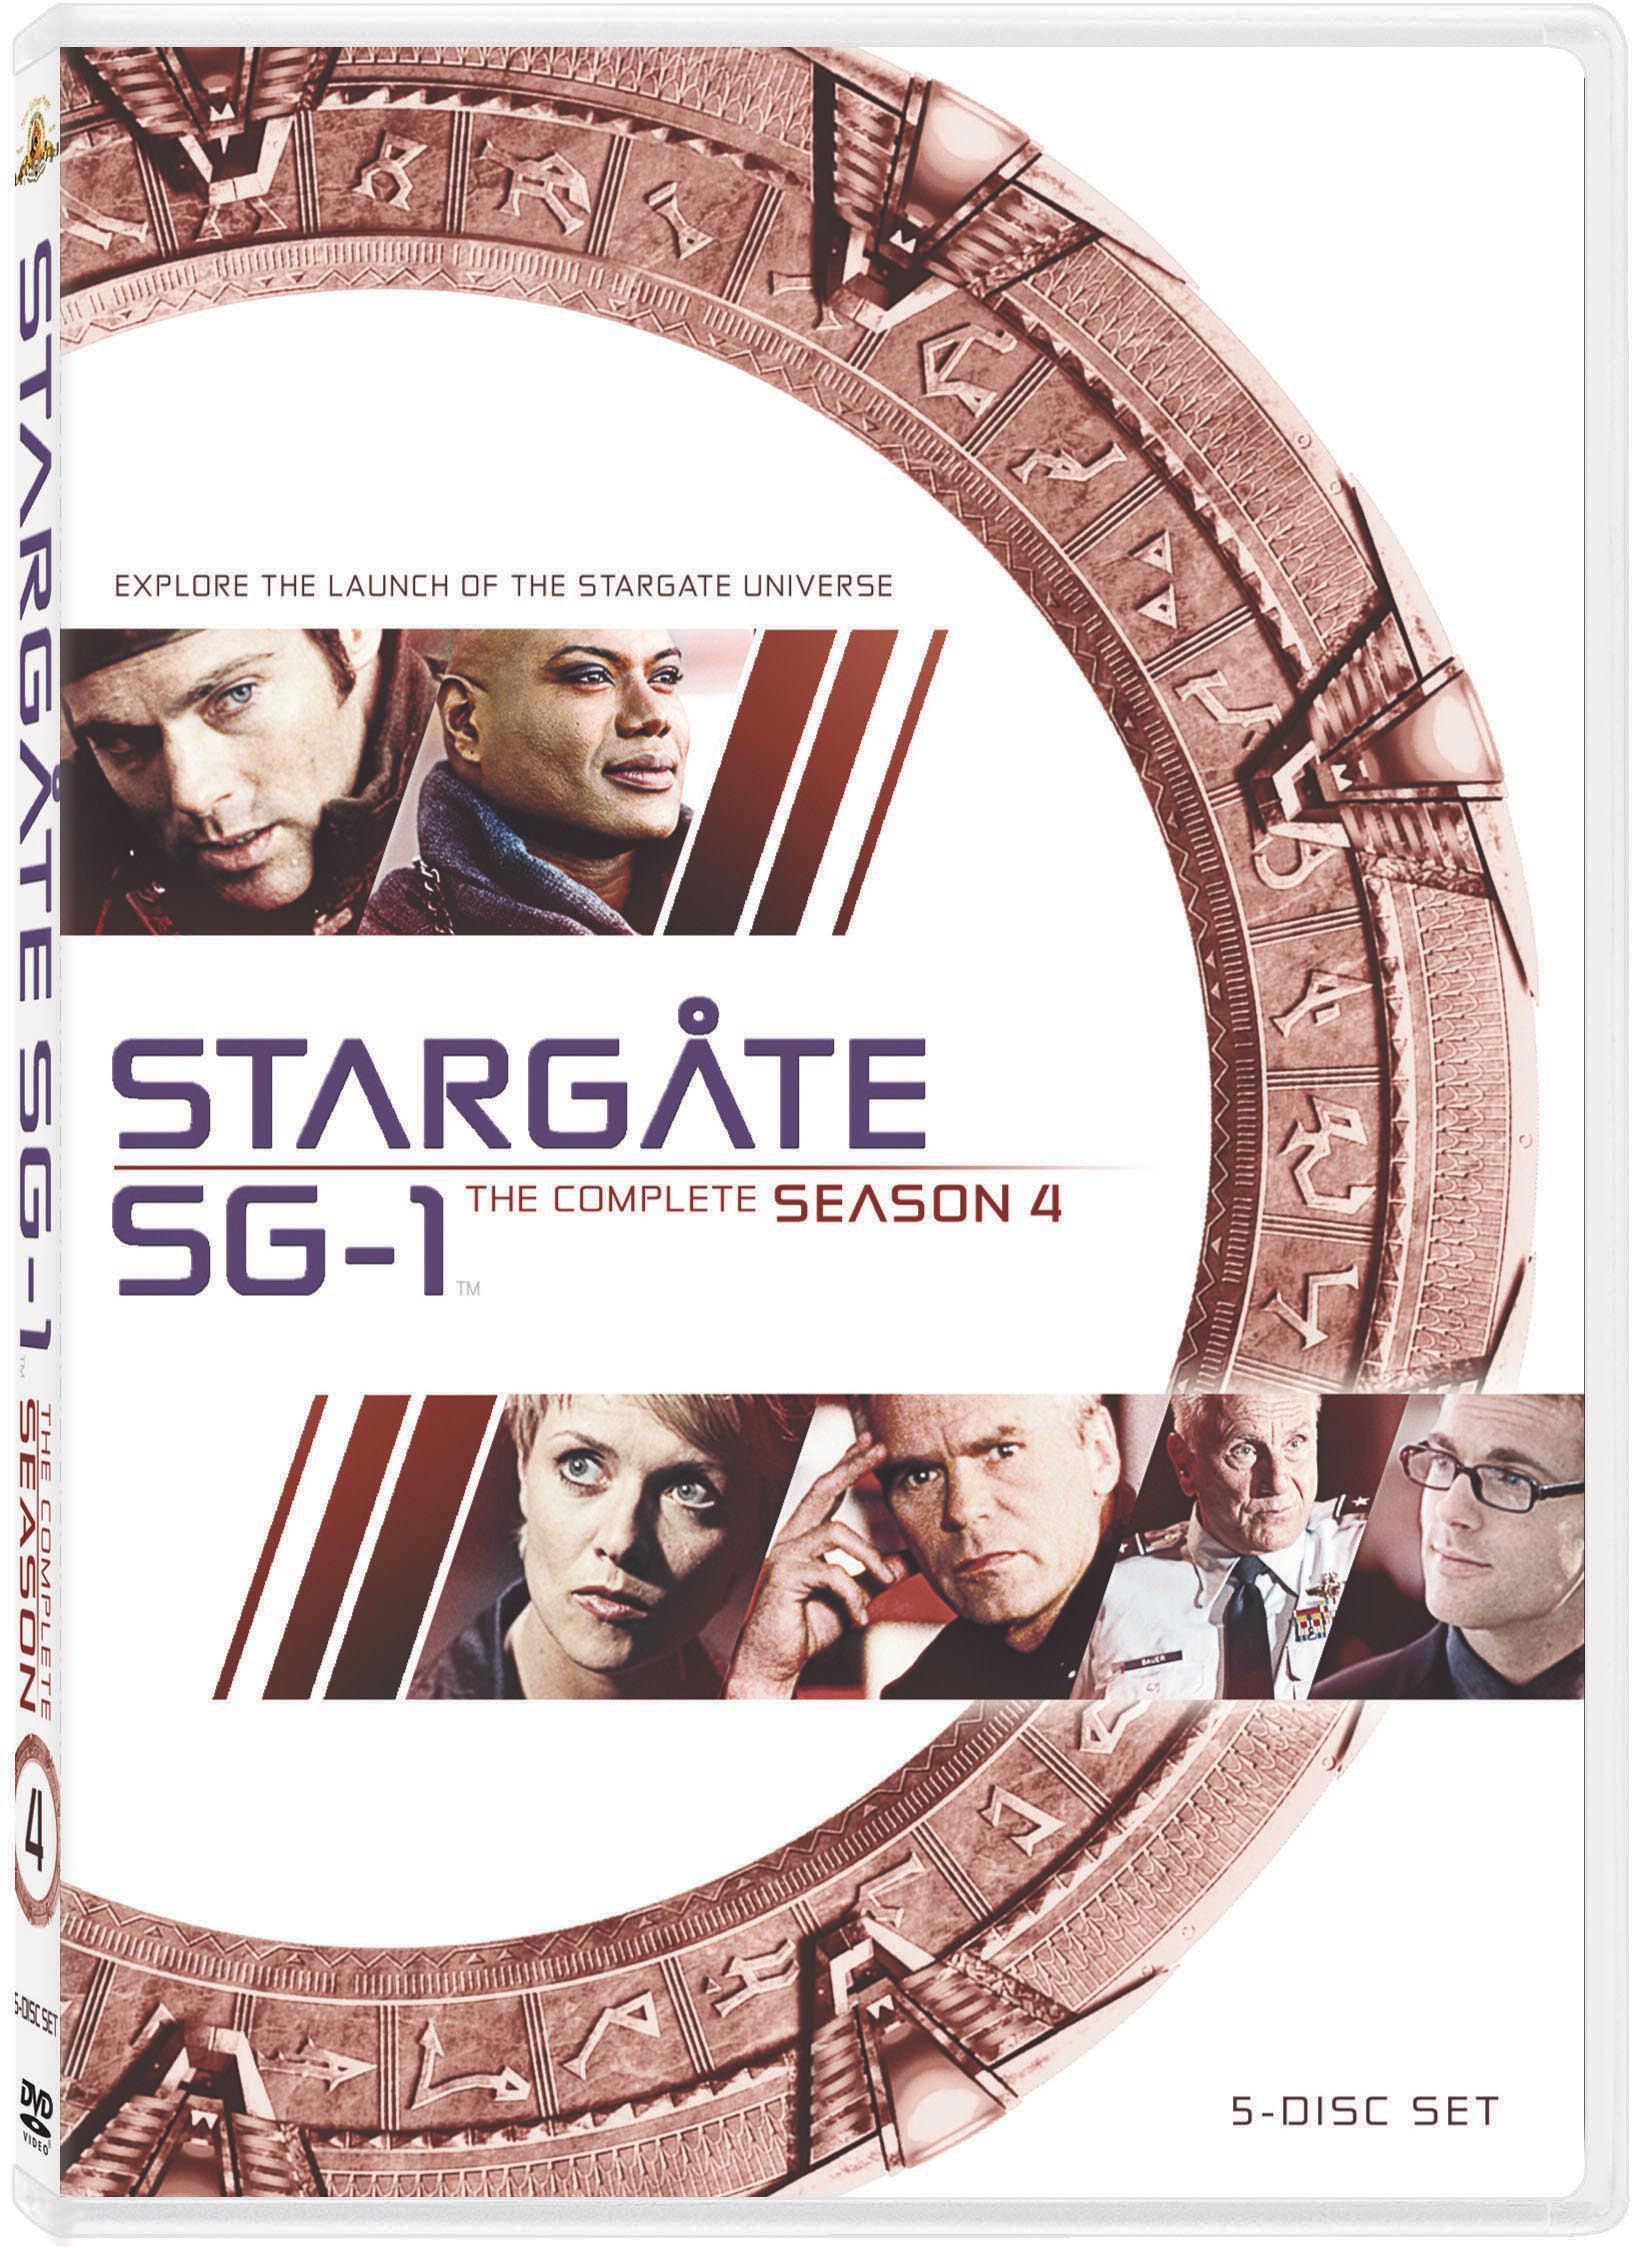 Stargate SG-1: The Complete Season 4 by METRO-GOLDWYN-MAYER INC